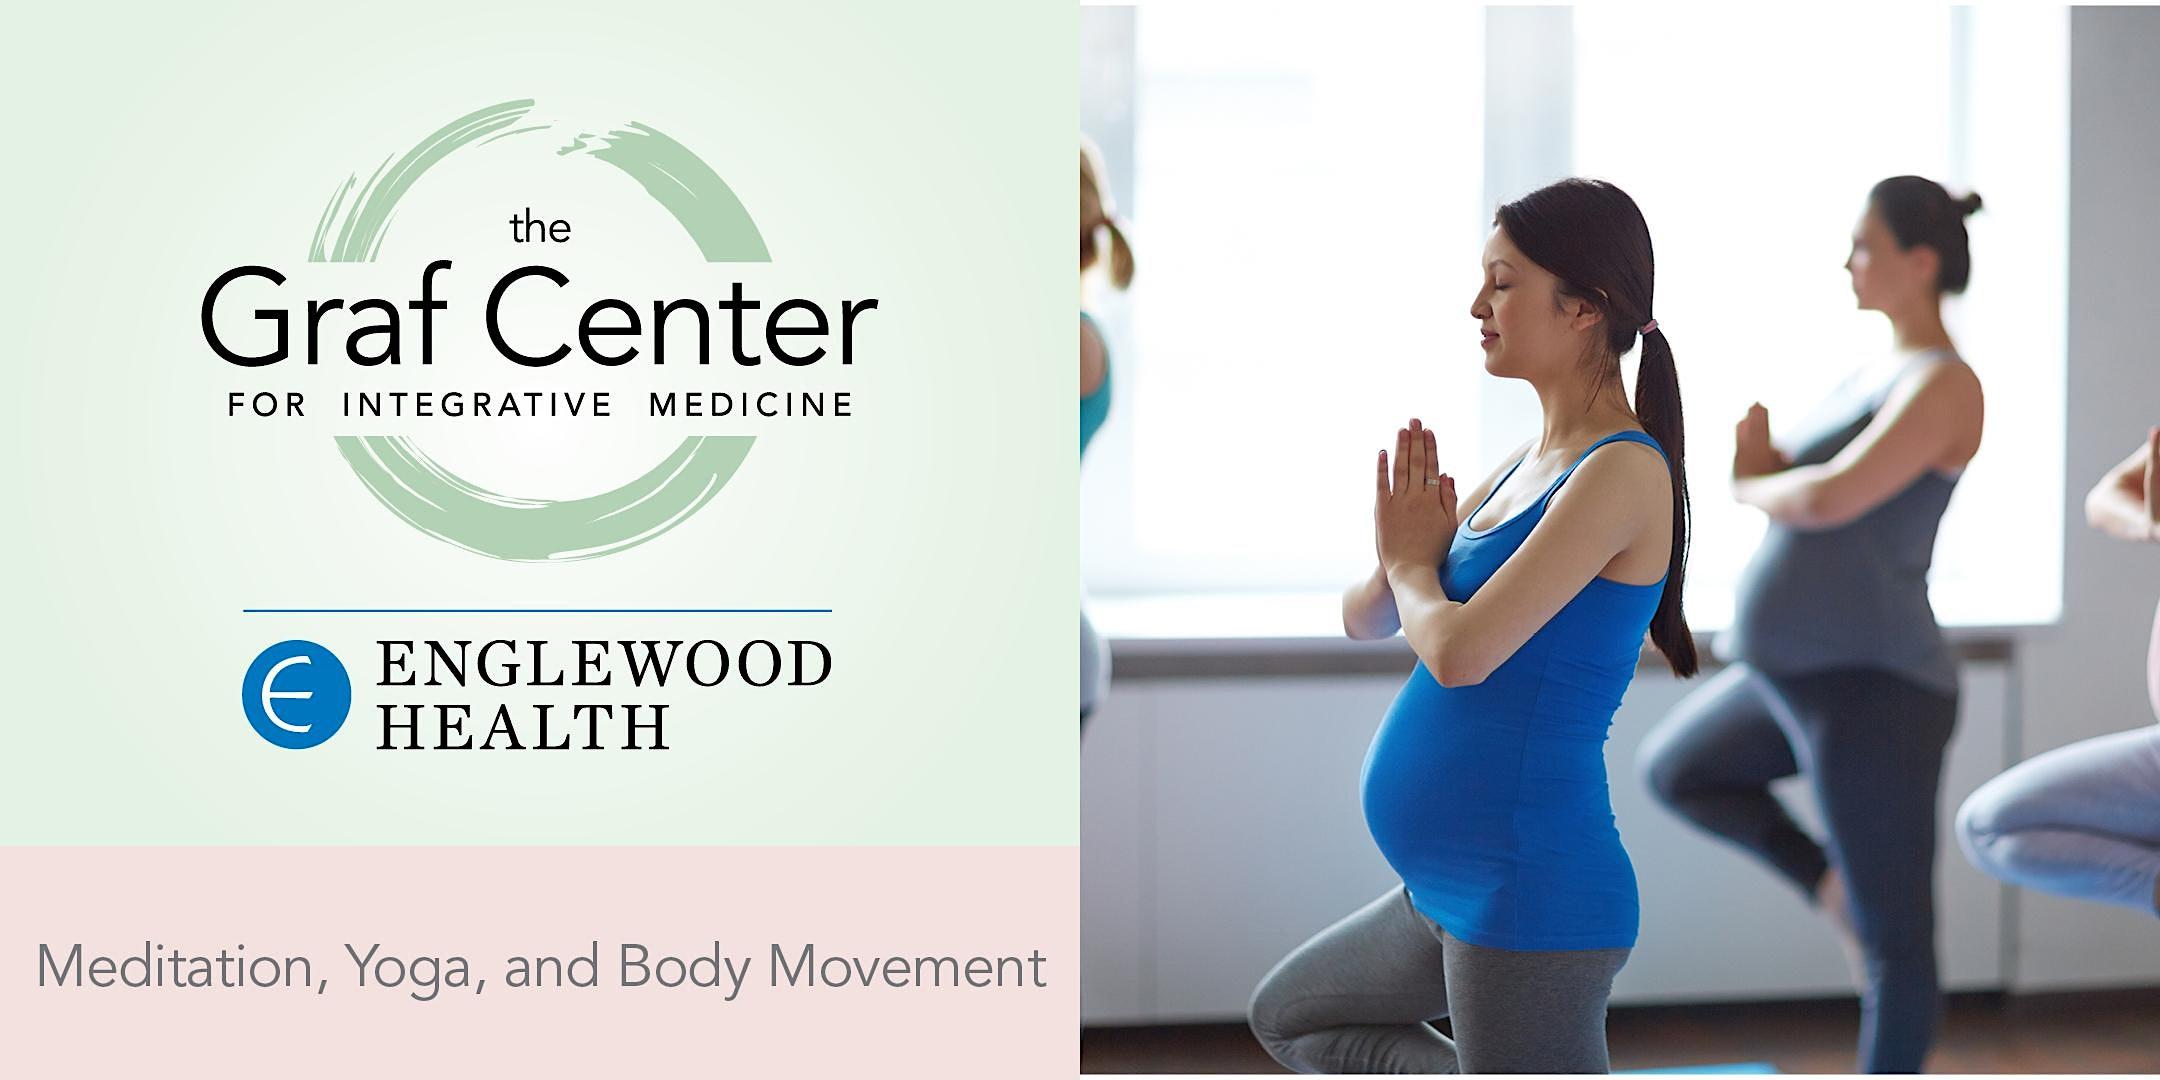 More info: Prenatal Yoga and Meditation (8-week series) - Beginning November 2021